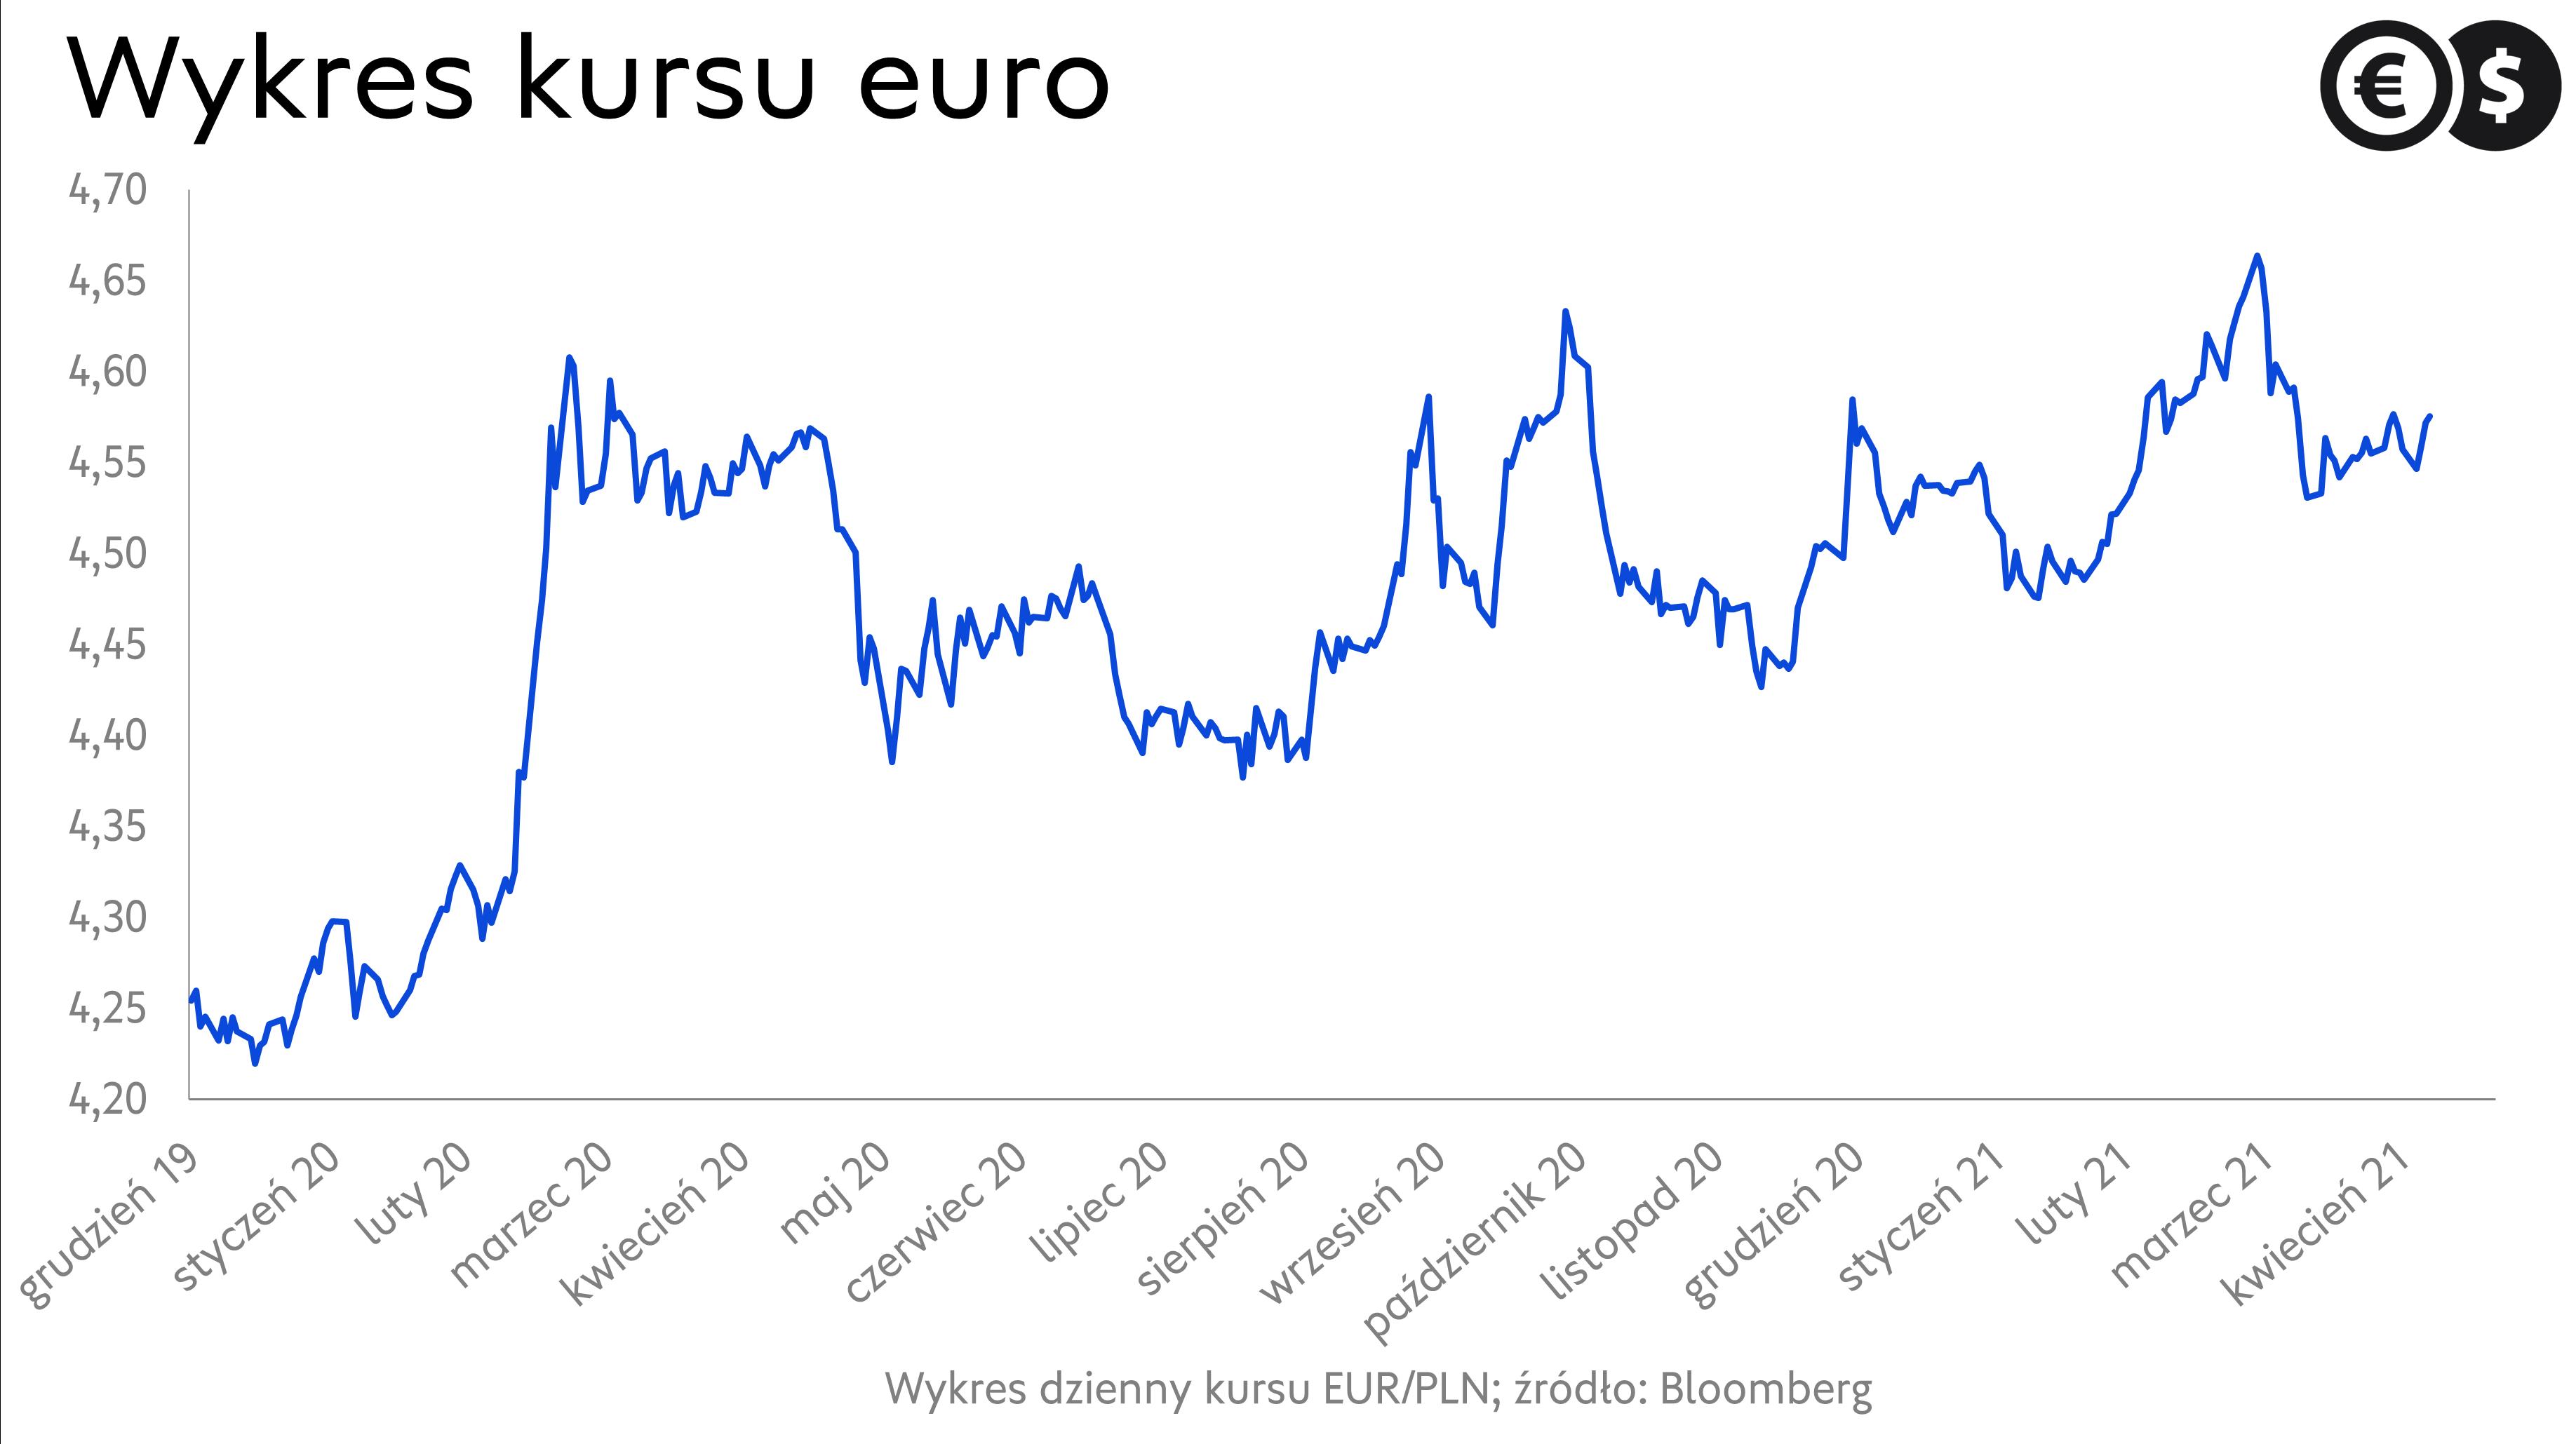 Kurs EUR/PLN, notowania euro; źródło: Bloomberg